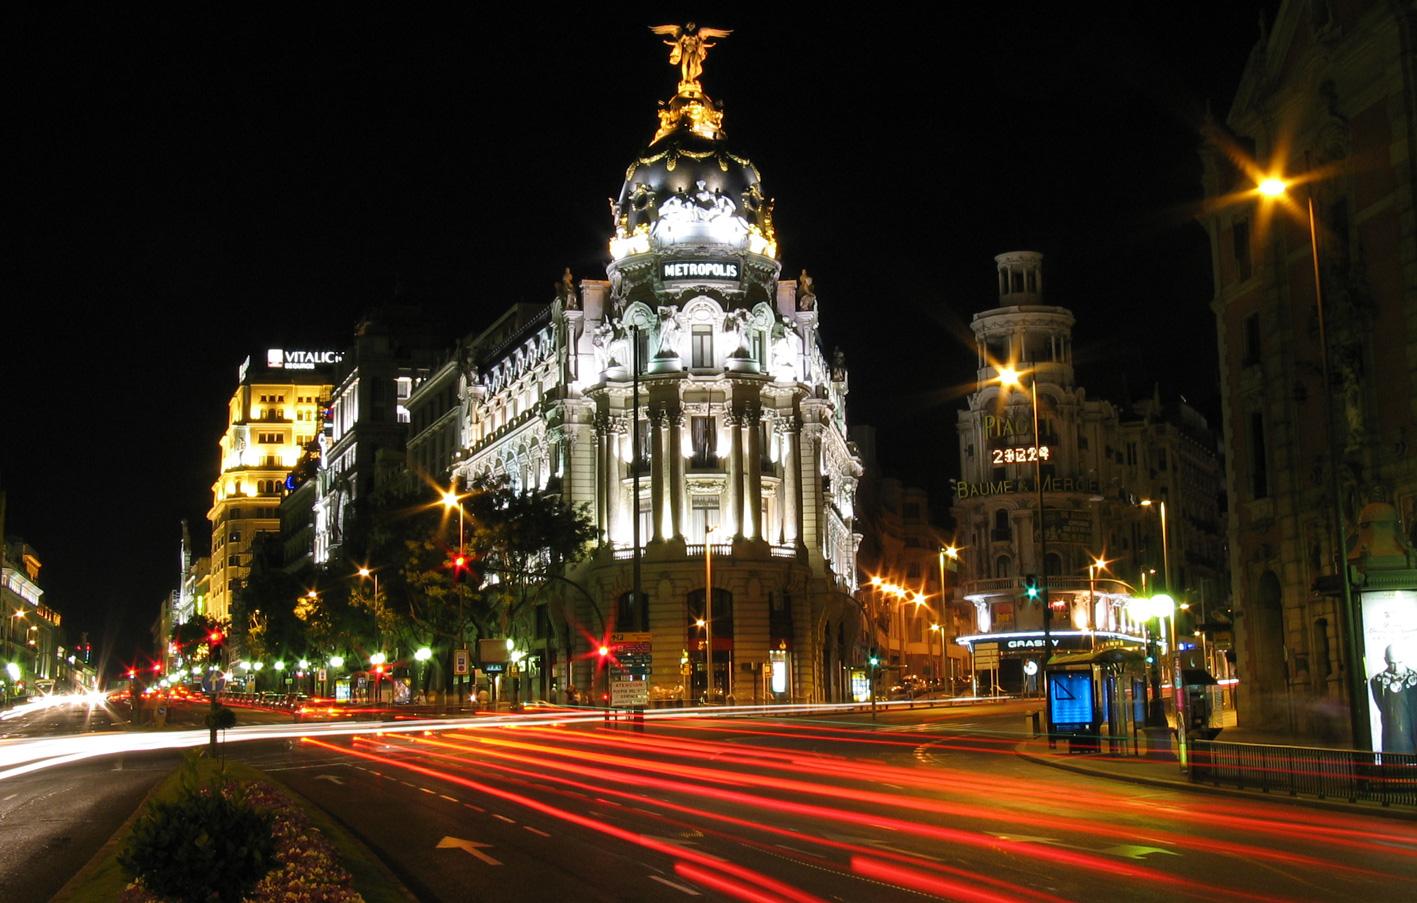 Calle_de_Alcalá_(Madrid)_04